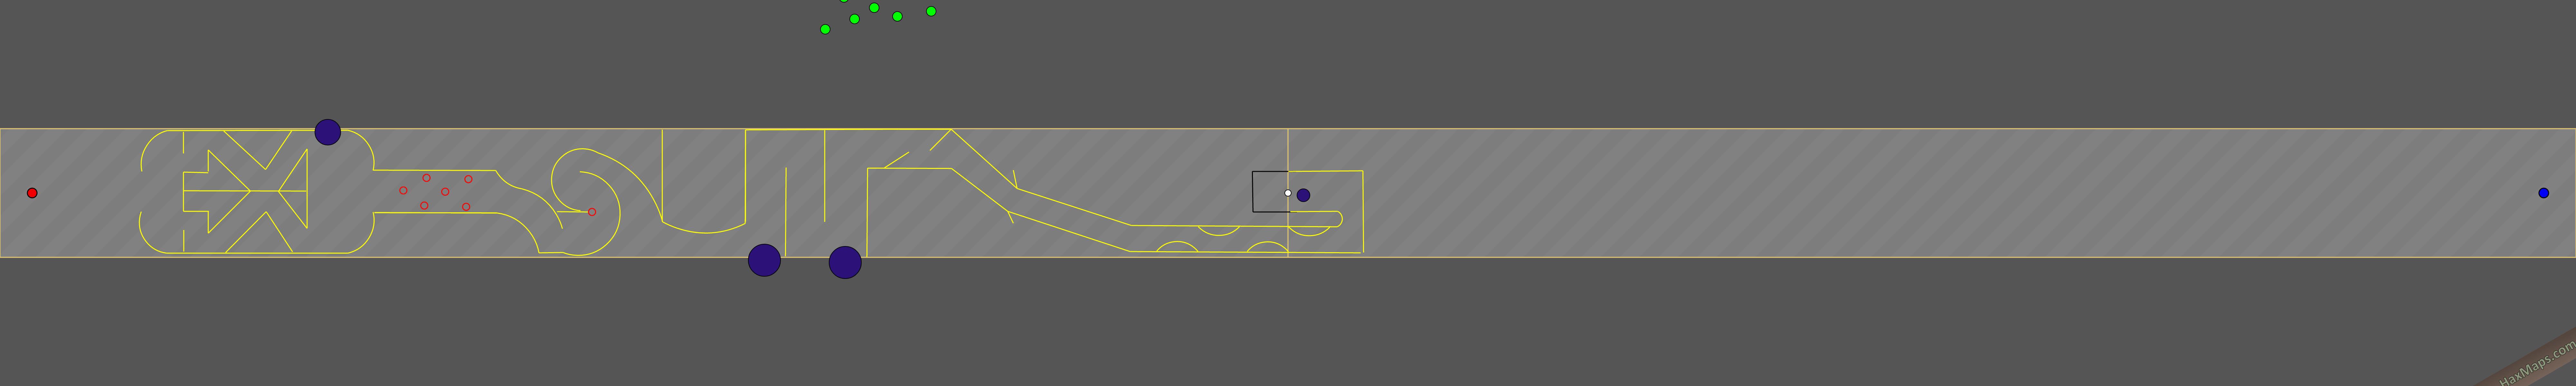 hax ball maps | Break Yellow Map